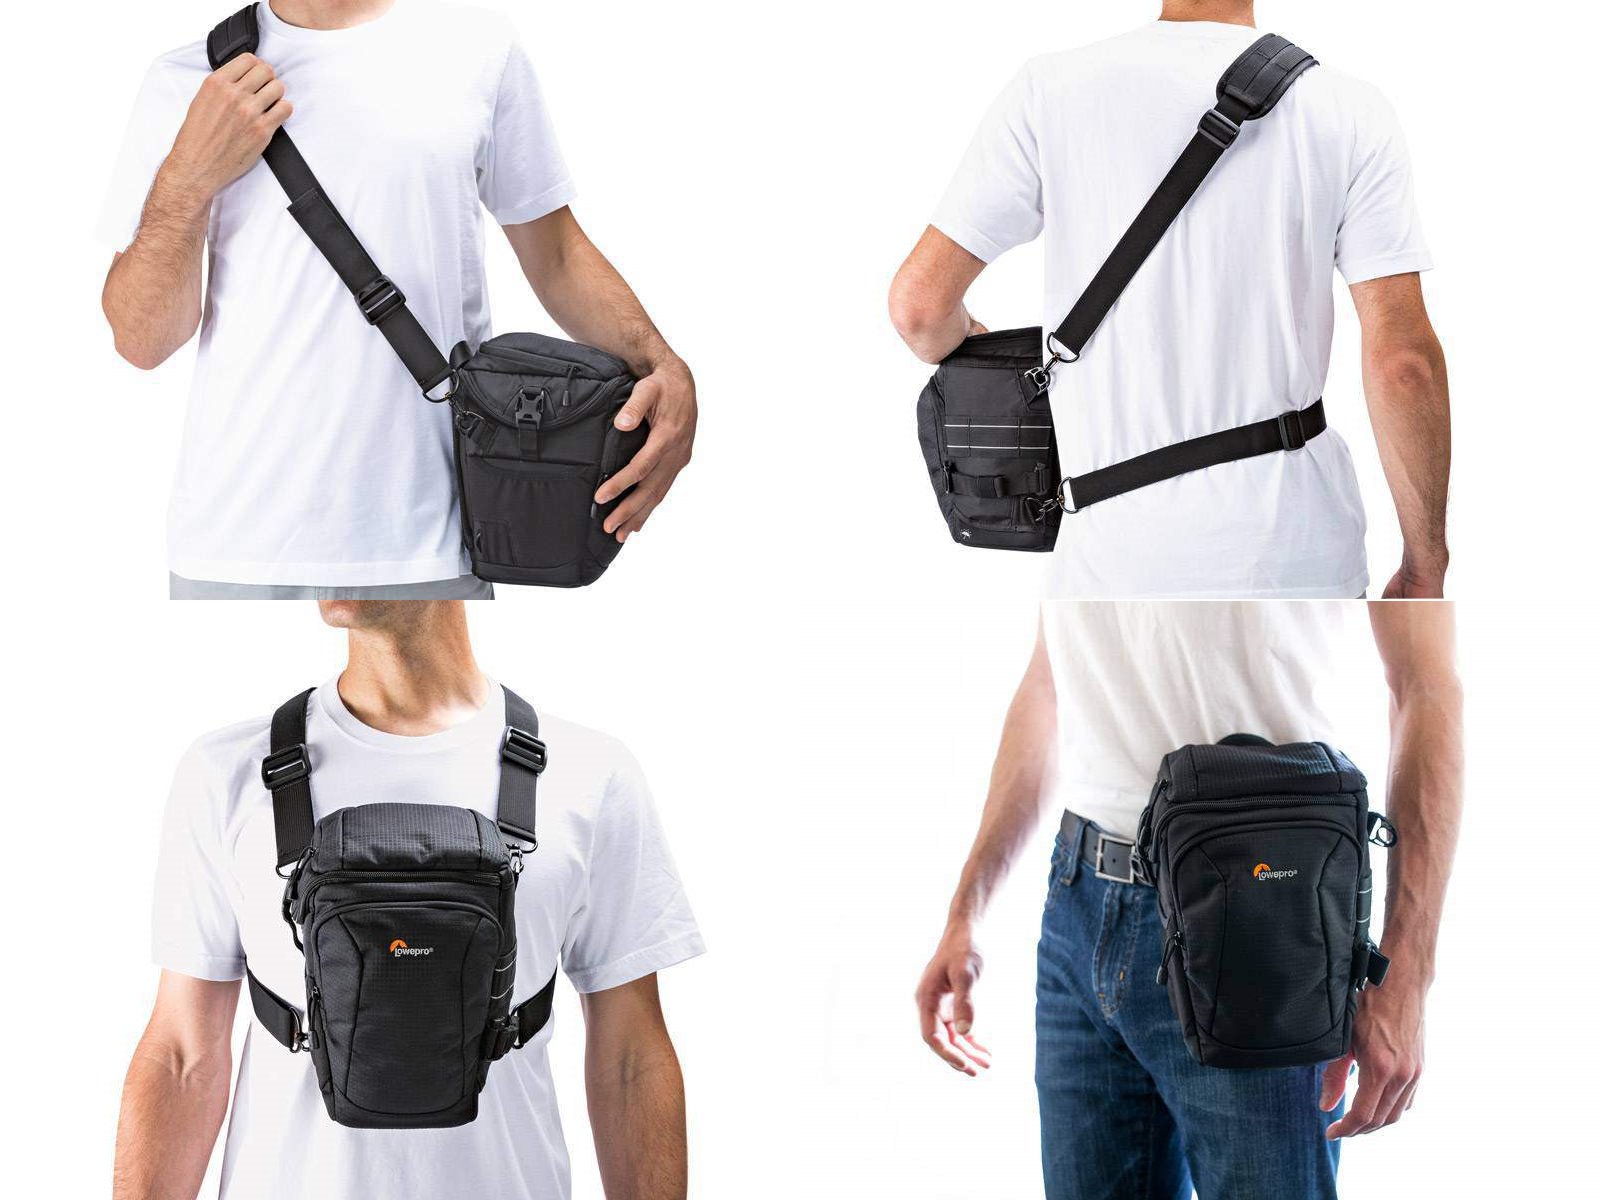 Lowepro Toploader Pro 75 Aw Ii Holster Bag Black 680891 Cr Zoom 45 Wear 4 Ways